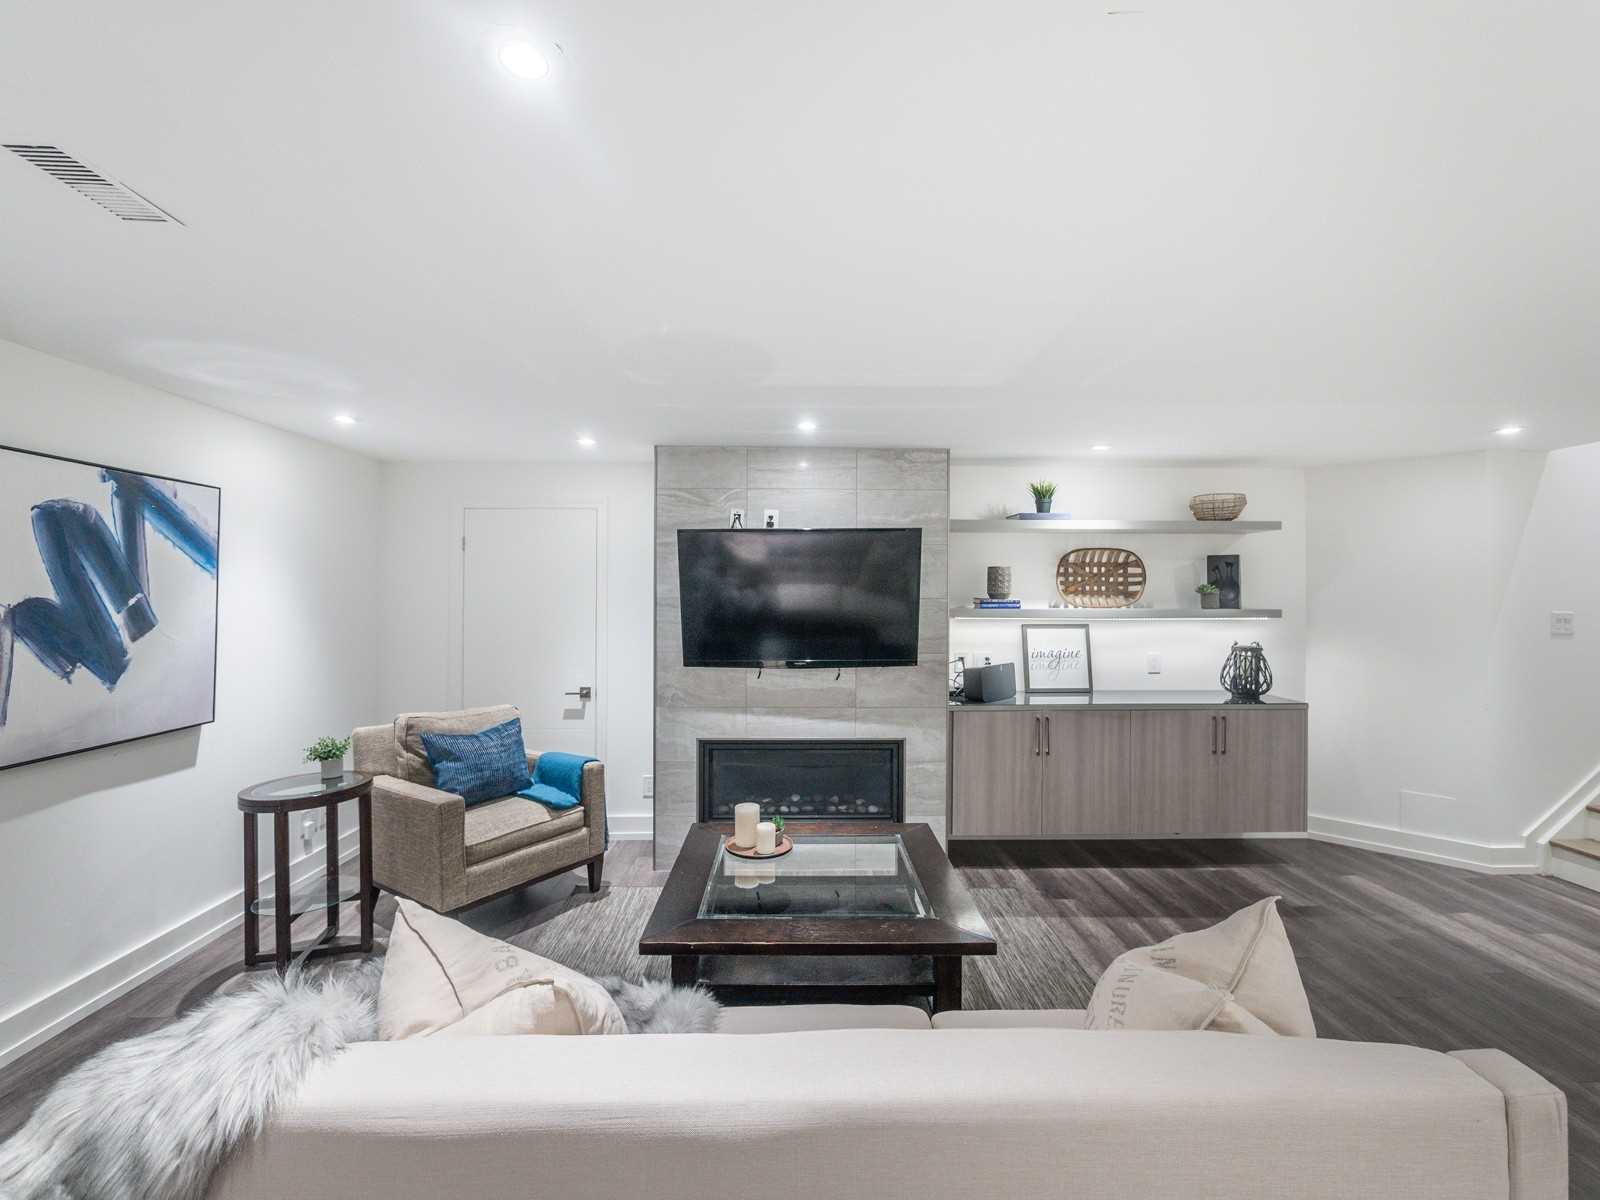 25 Sarah Ashbridge Ave, Toronto, Ontario M4L3Y1, 4 Bedrooms Bedrooms, 8 Rooms Rooms,5 BathroomsBathrooms,Detached,For Sale,Sarah Ashbridge,E5378607